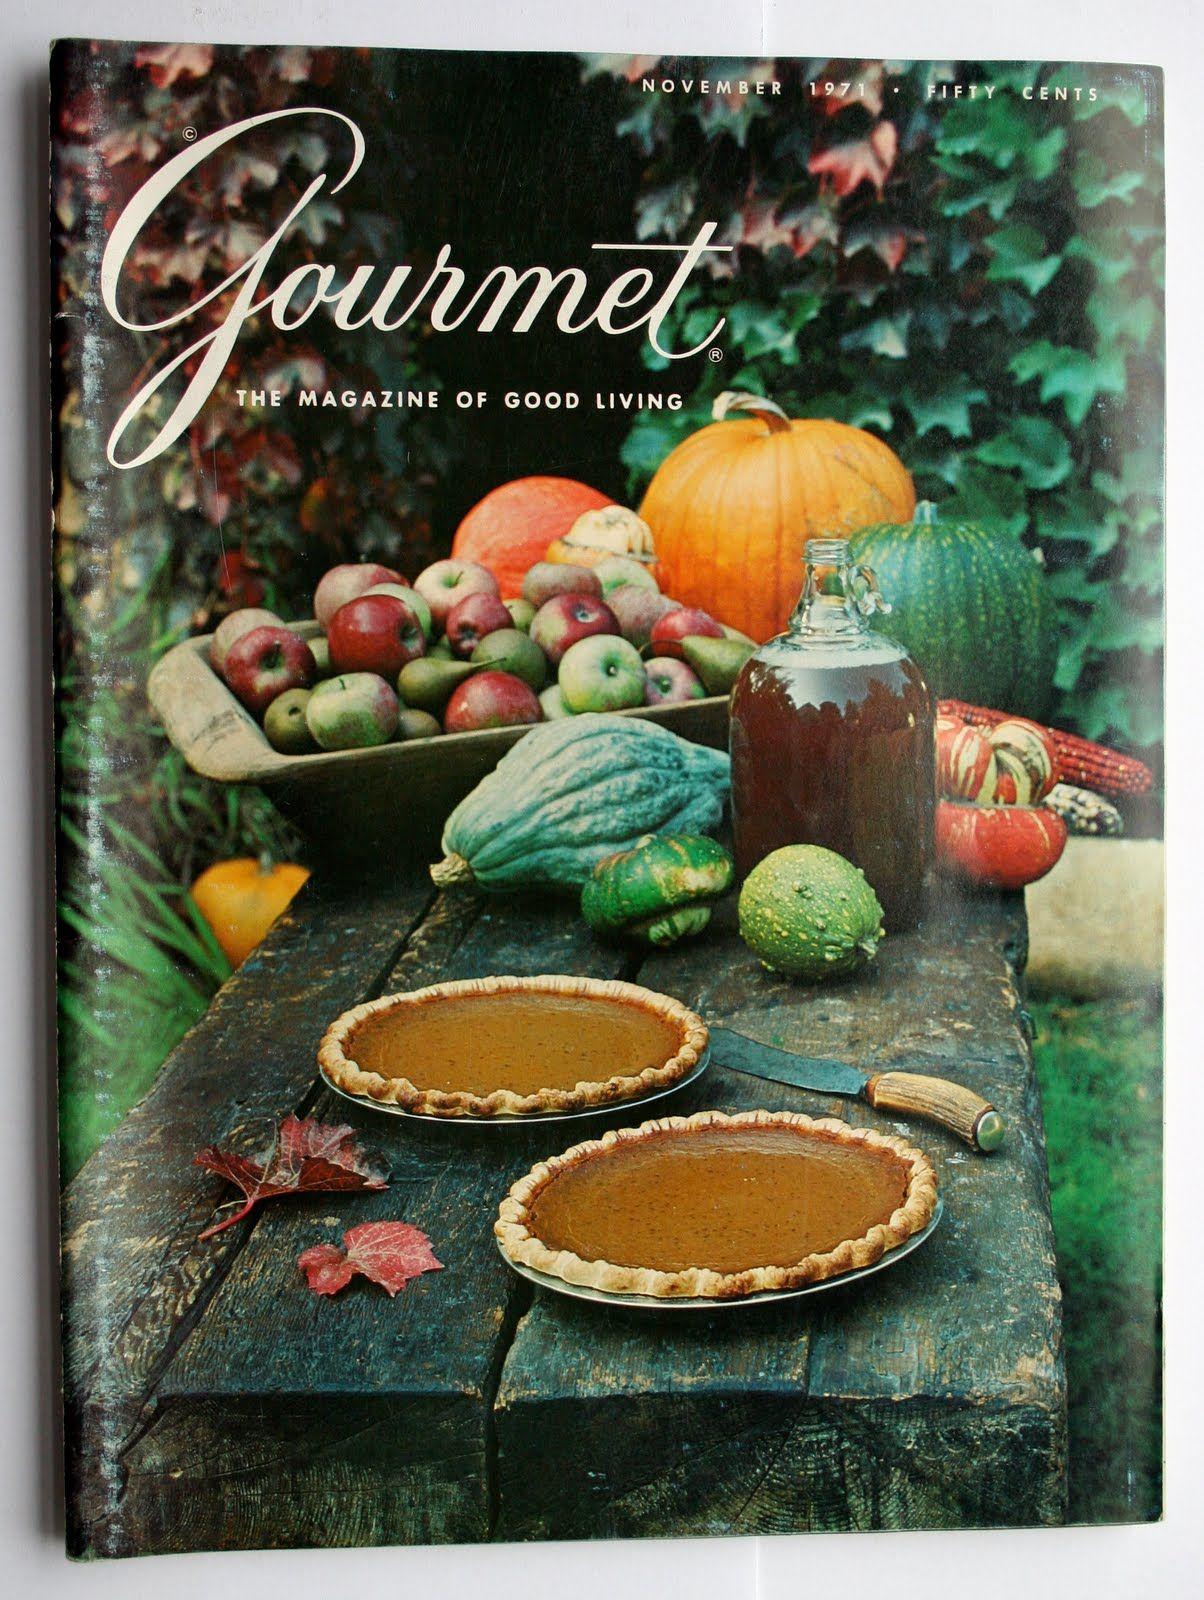 Gourmet, November 1971 cover.